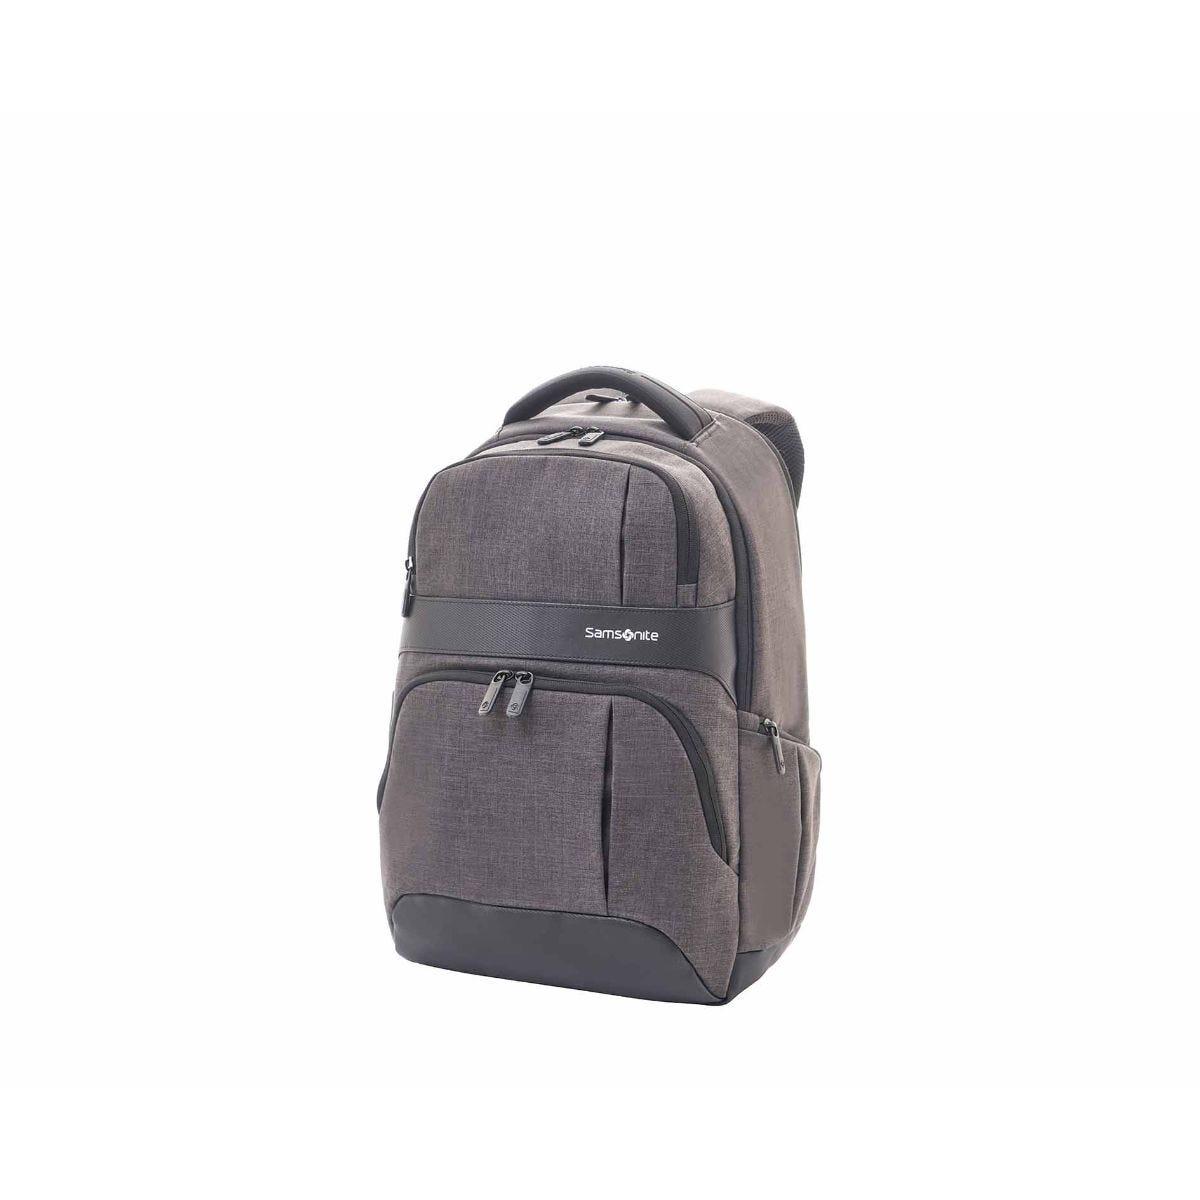 samsonite Backpacks   Holdalls Bags   Luggage Stationery - Ryman 9d3a2ab8b2efc